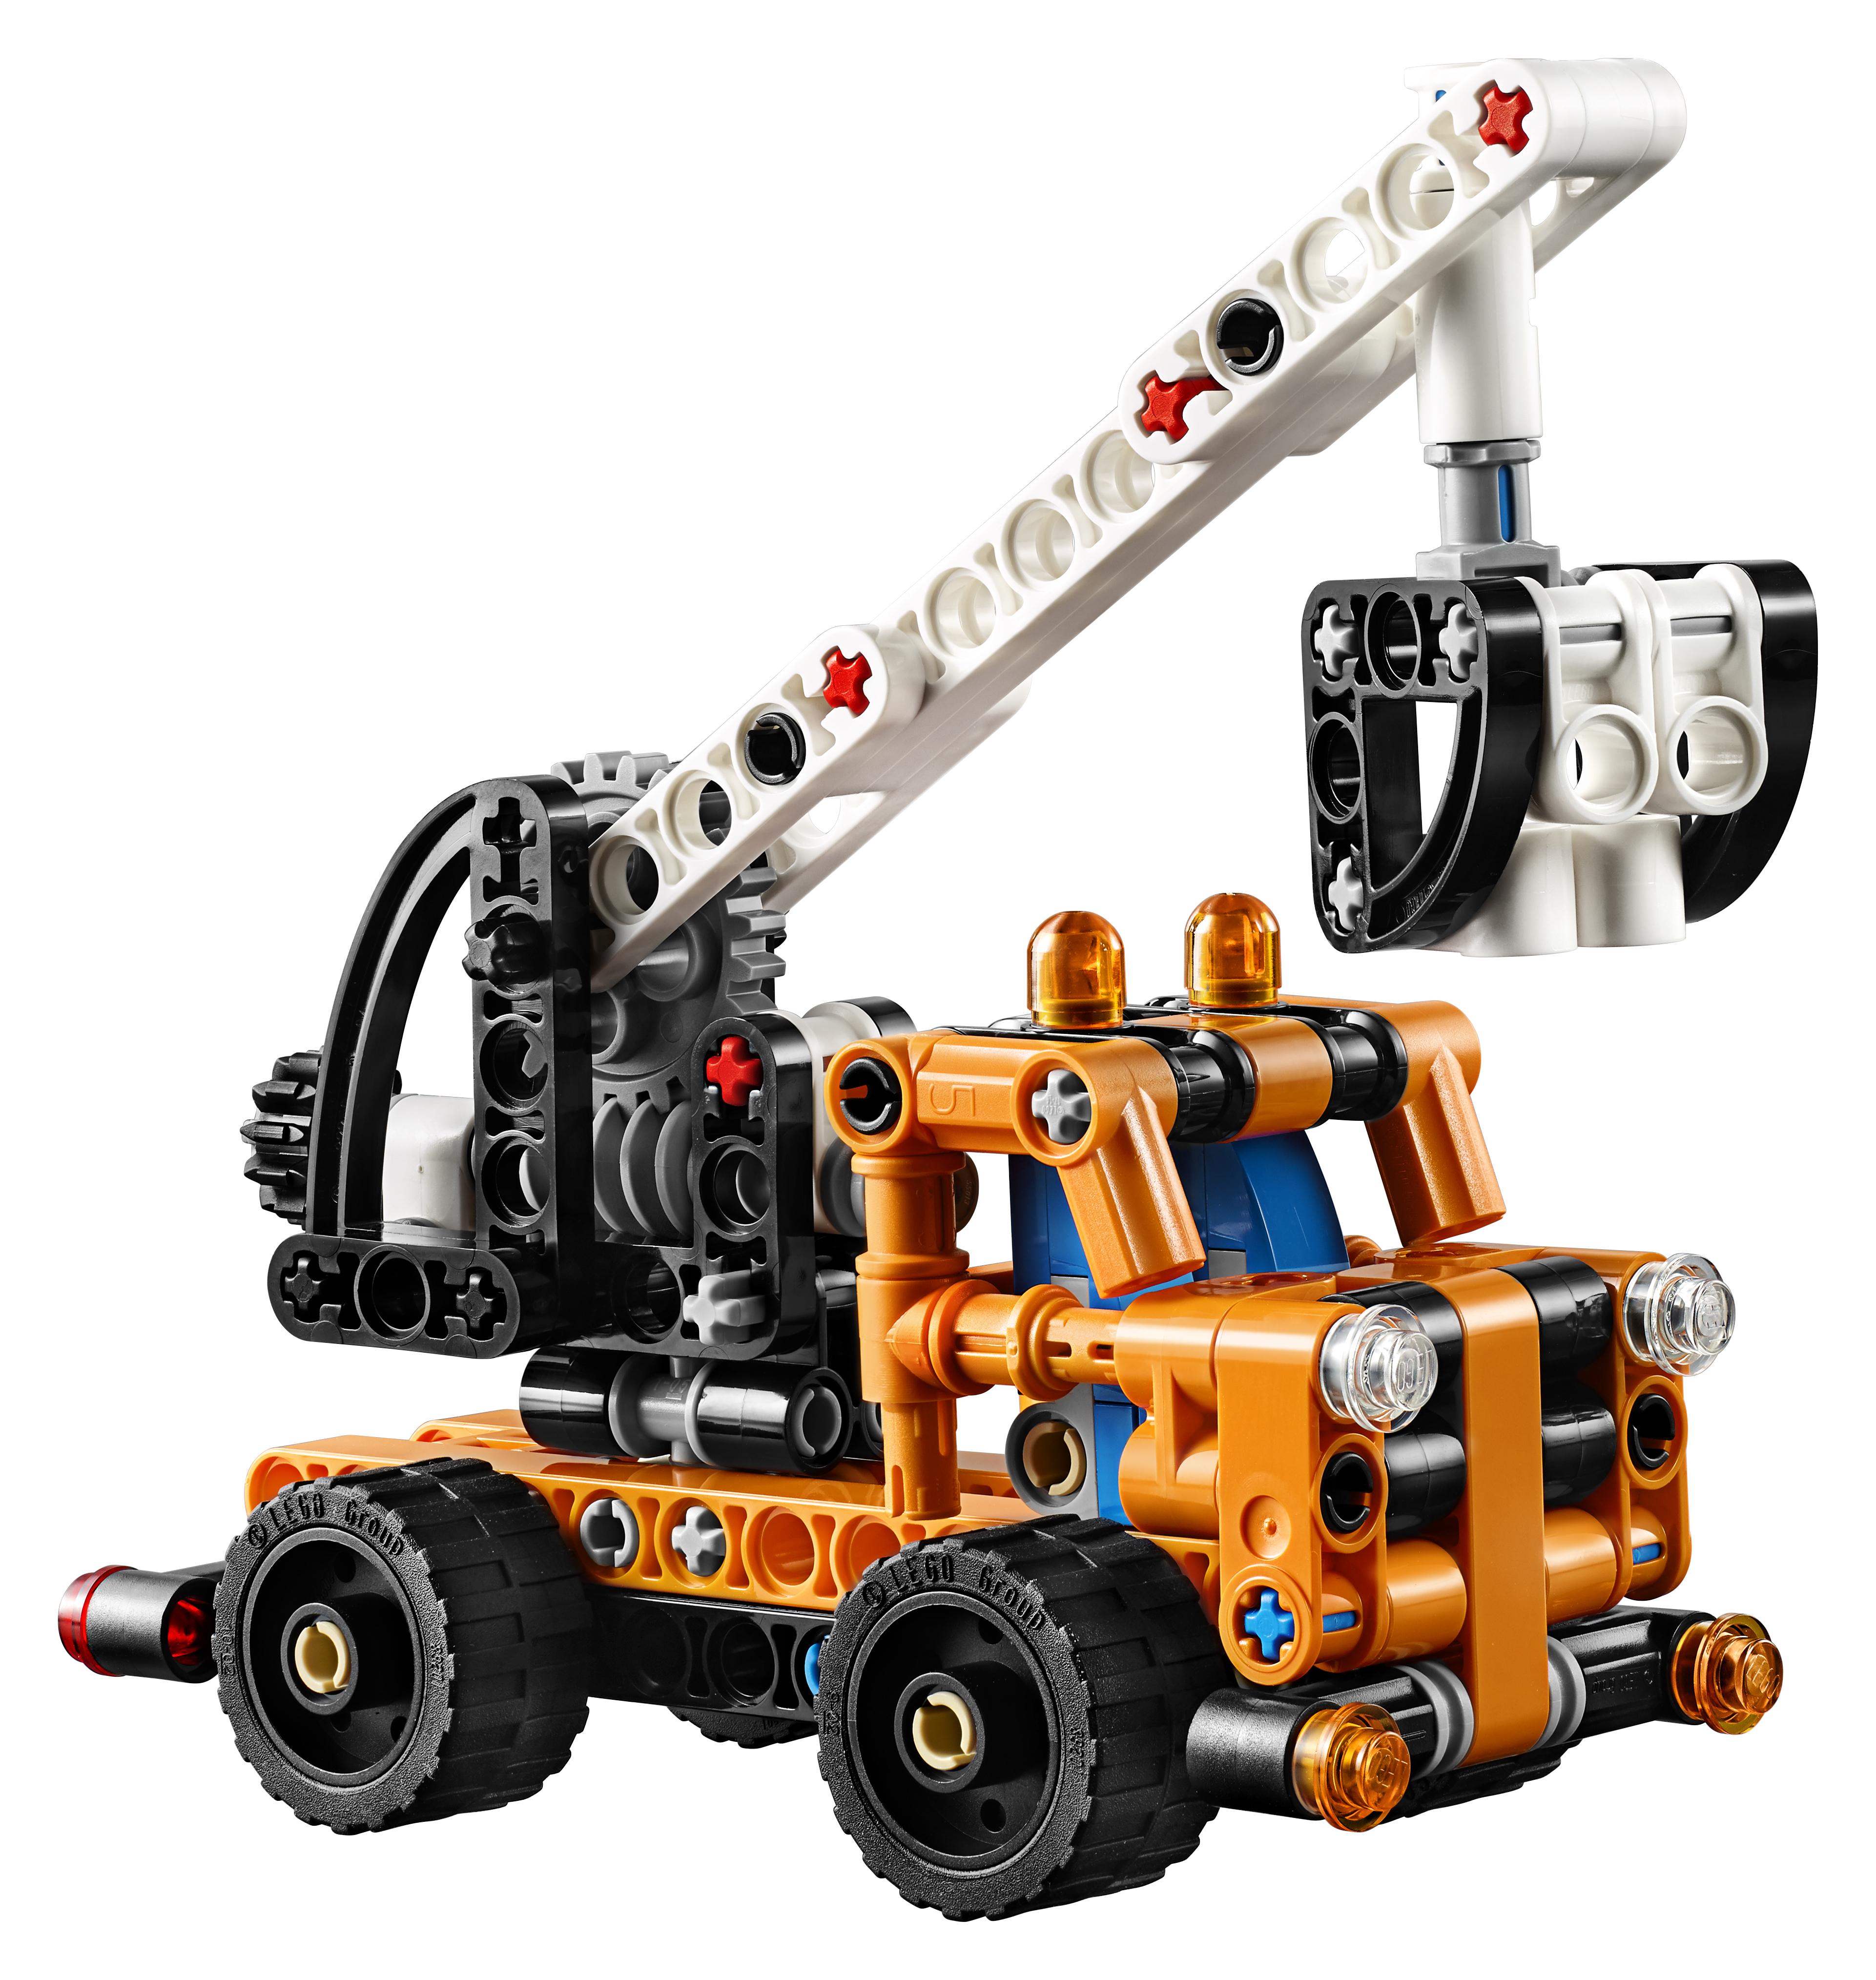 LEGO Technic - Cherry Picker (42088)